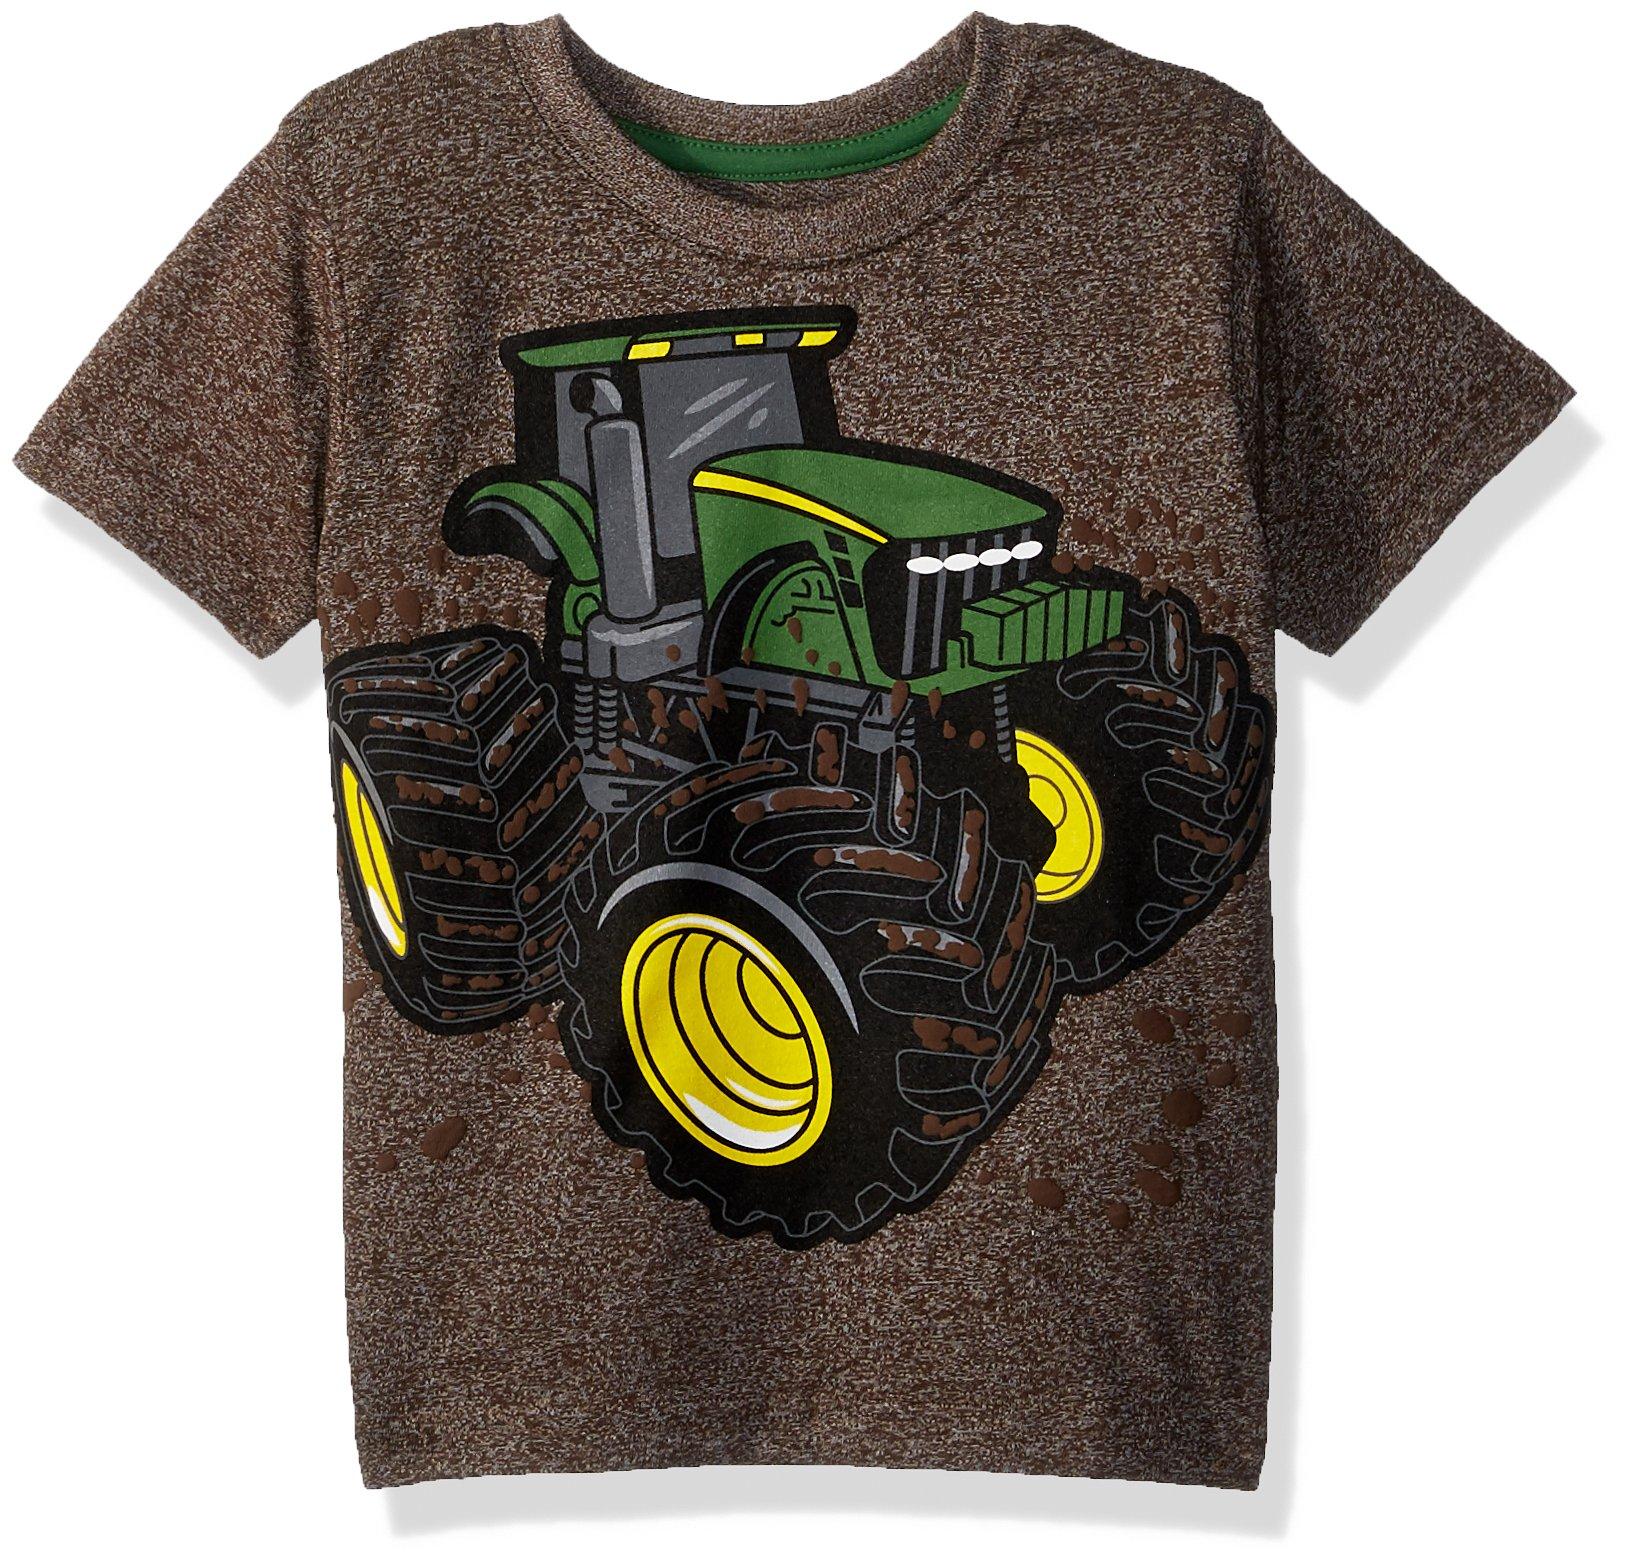 John Deere Toddler Boys' T-Shirt